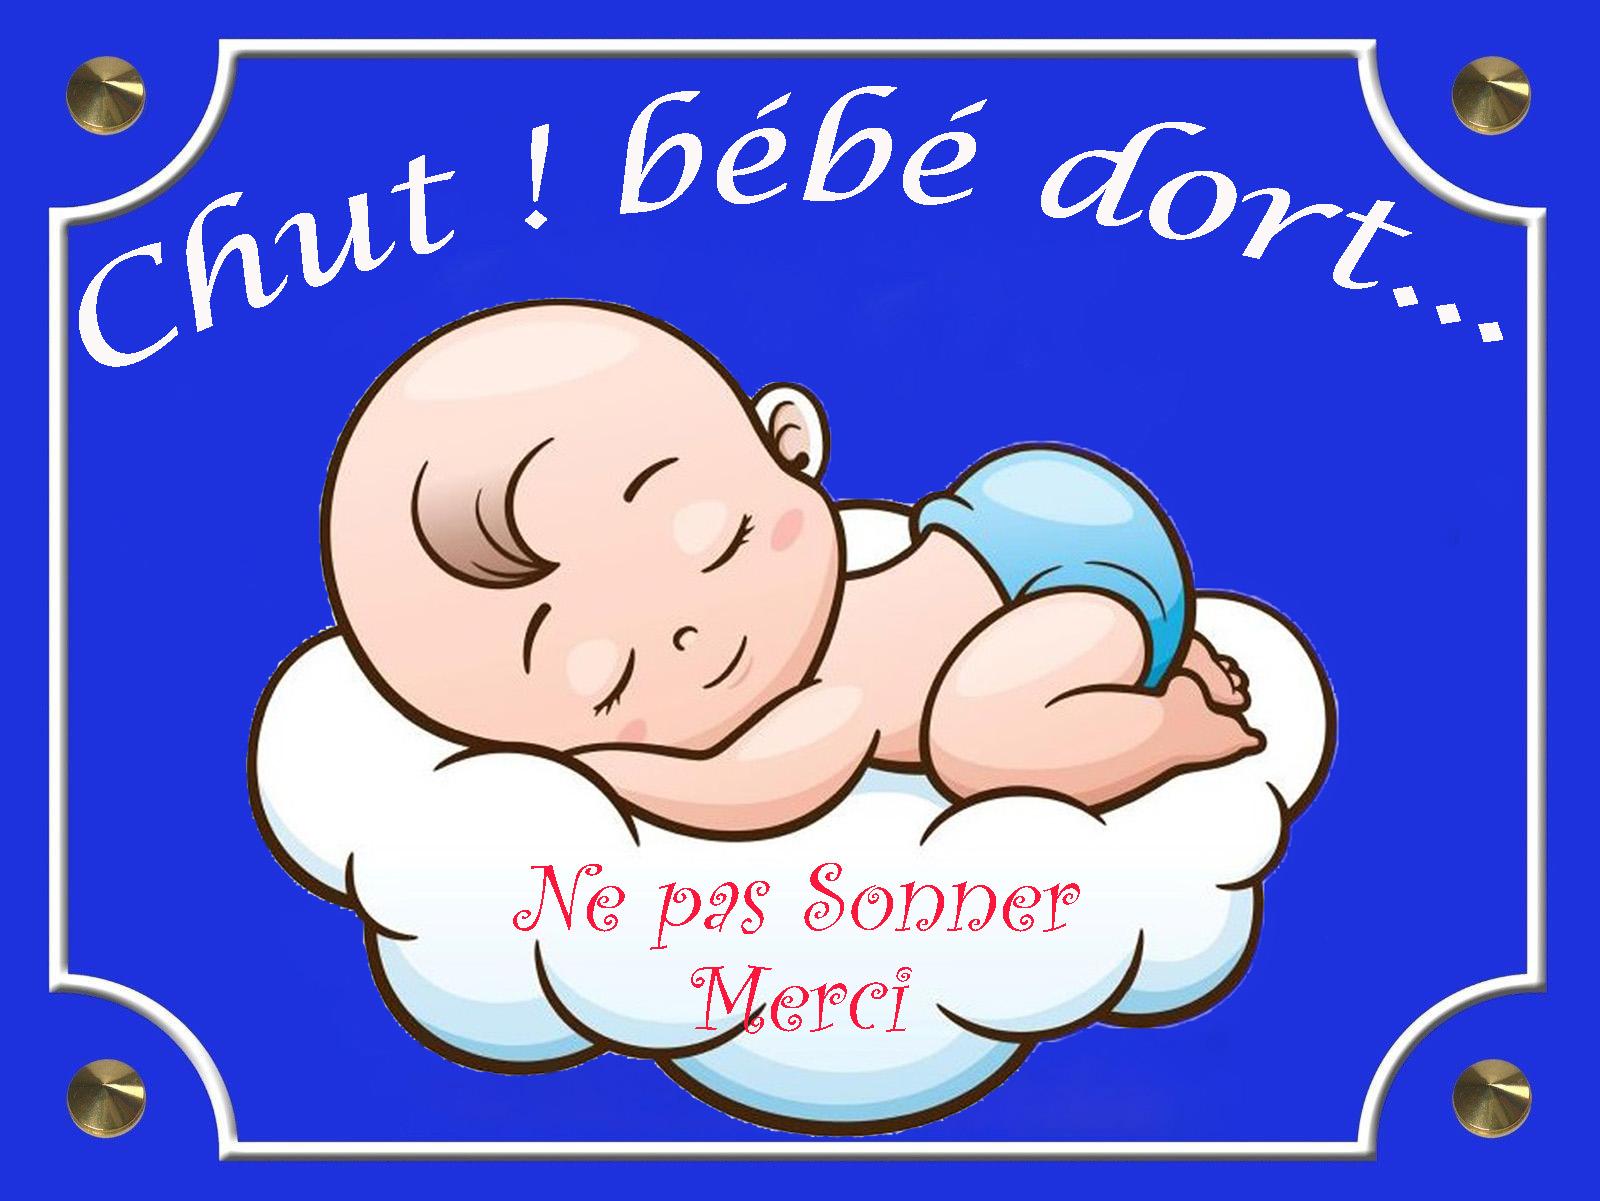 Chut ! bébé dort...6